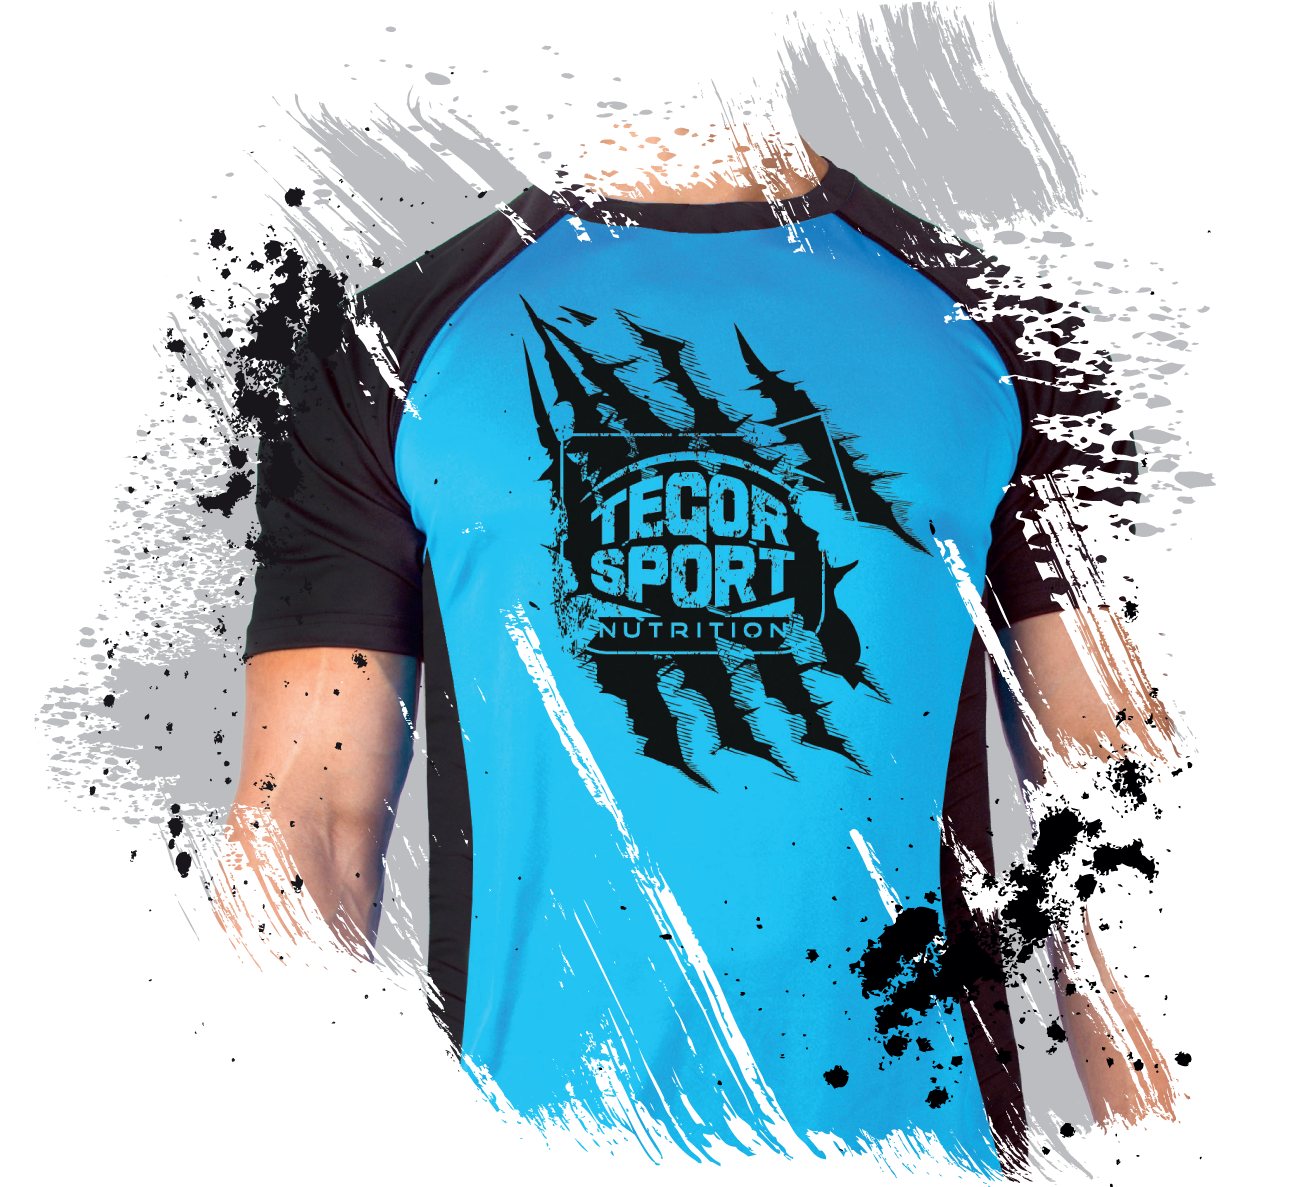 Camisetas-tegor-sport